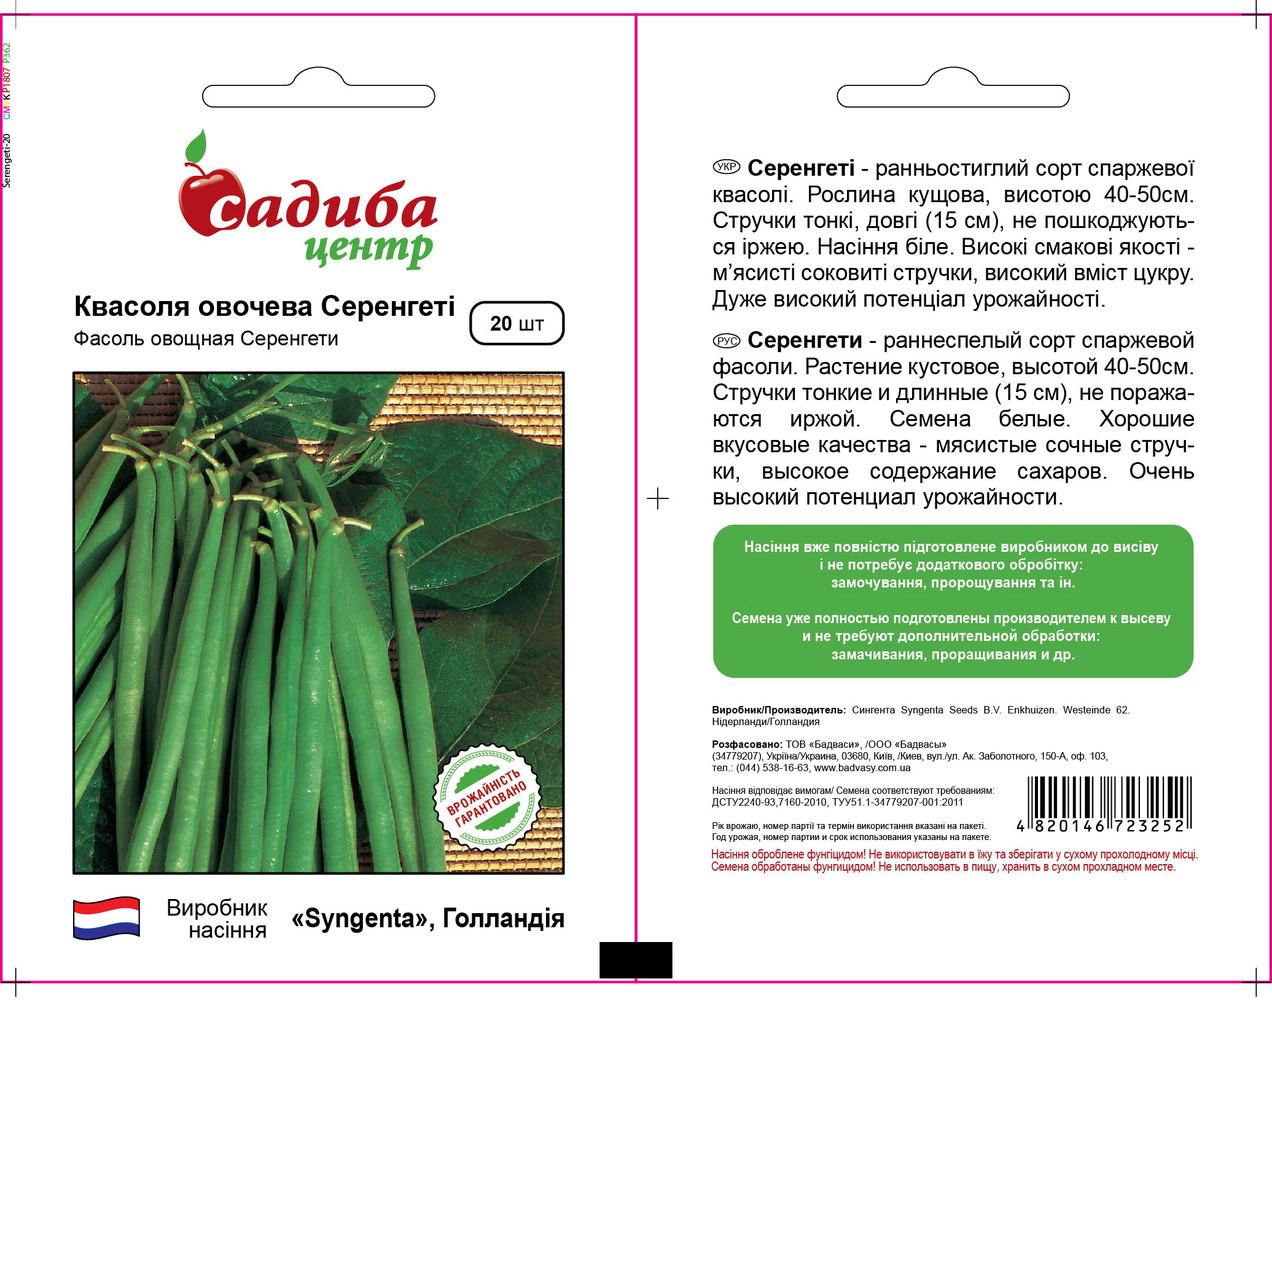 Семена фасоли Серенгети (Syngenta/САДЫБА ЦЕНТР), 20 шт — ранняя (55 дней), спаржевая